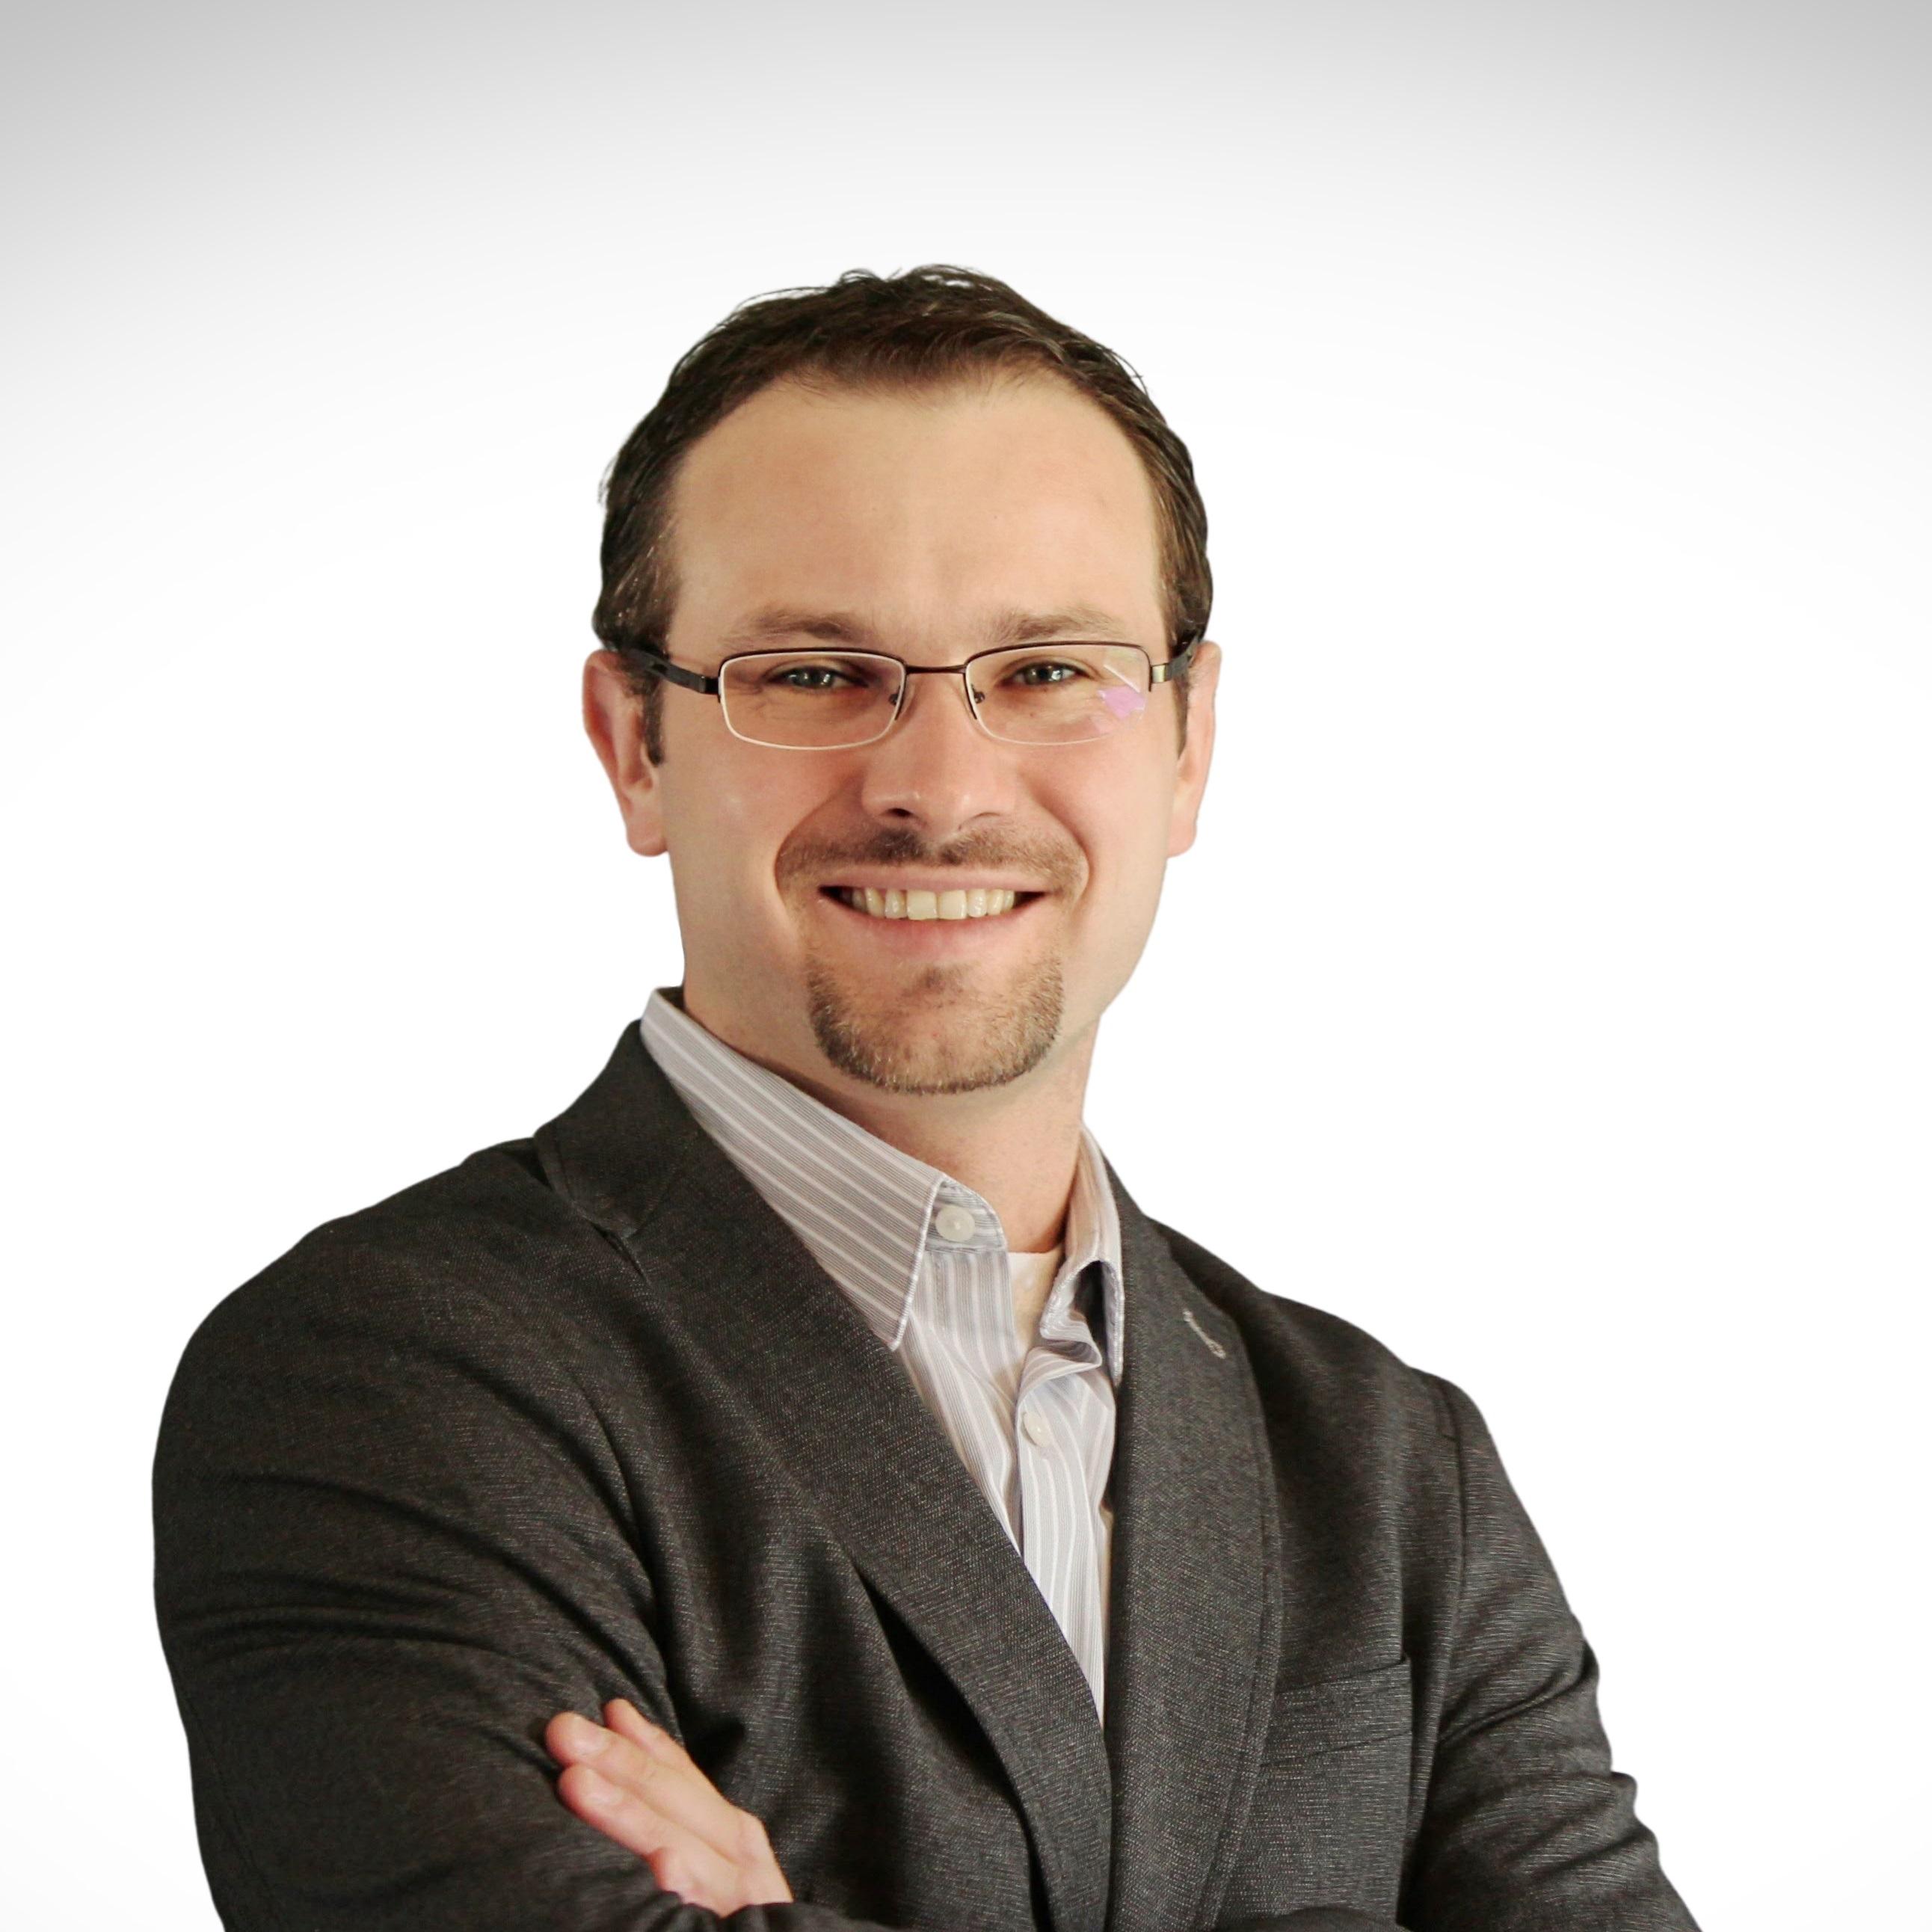 Matt Magolan